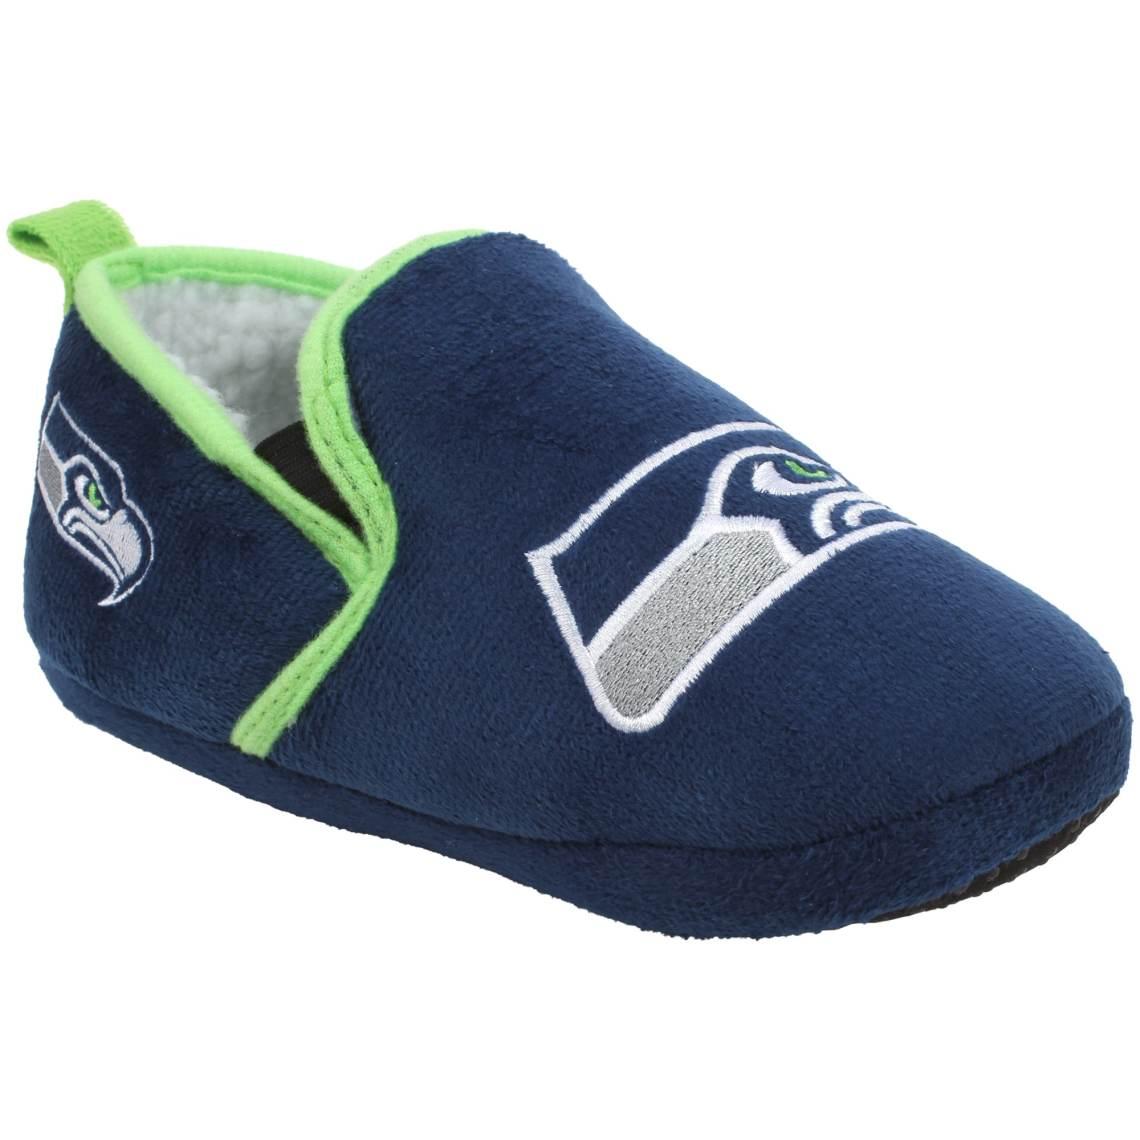 Youth Seattle Seahawks Sherpa Slippers